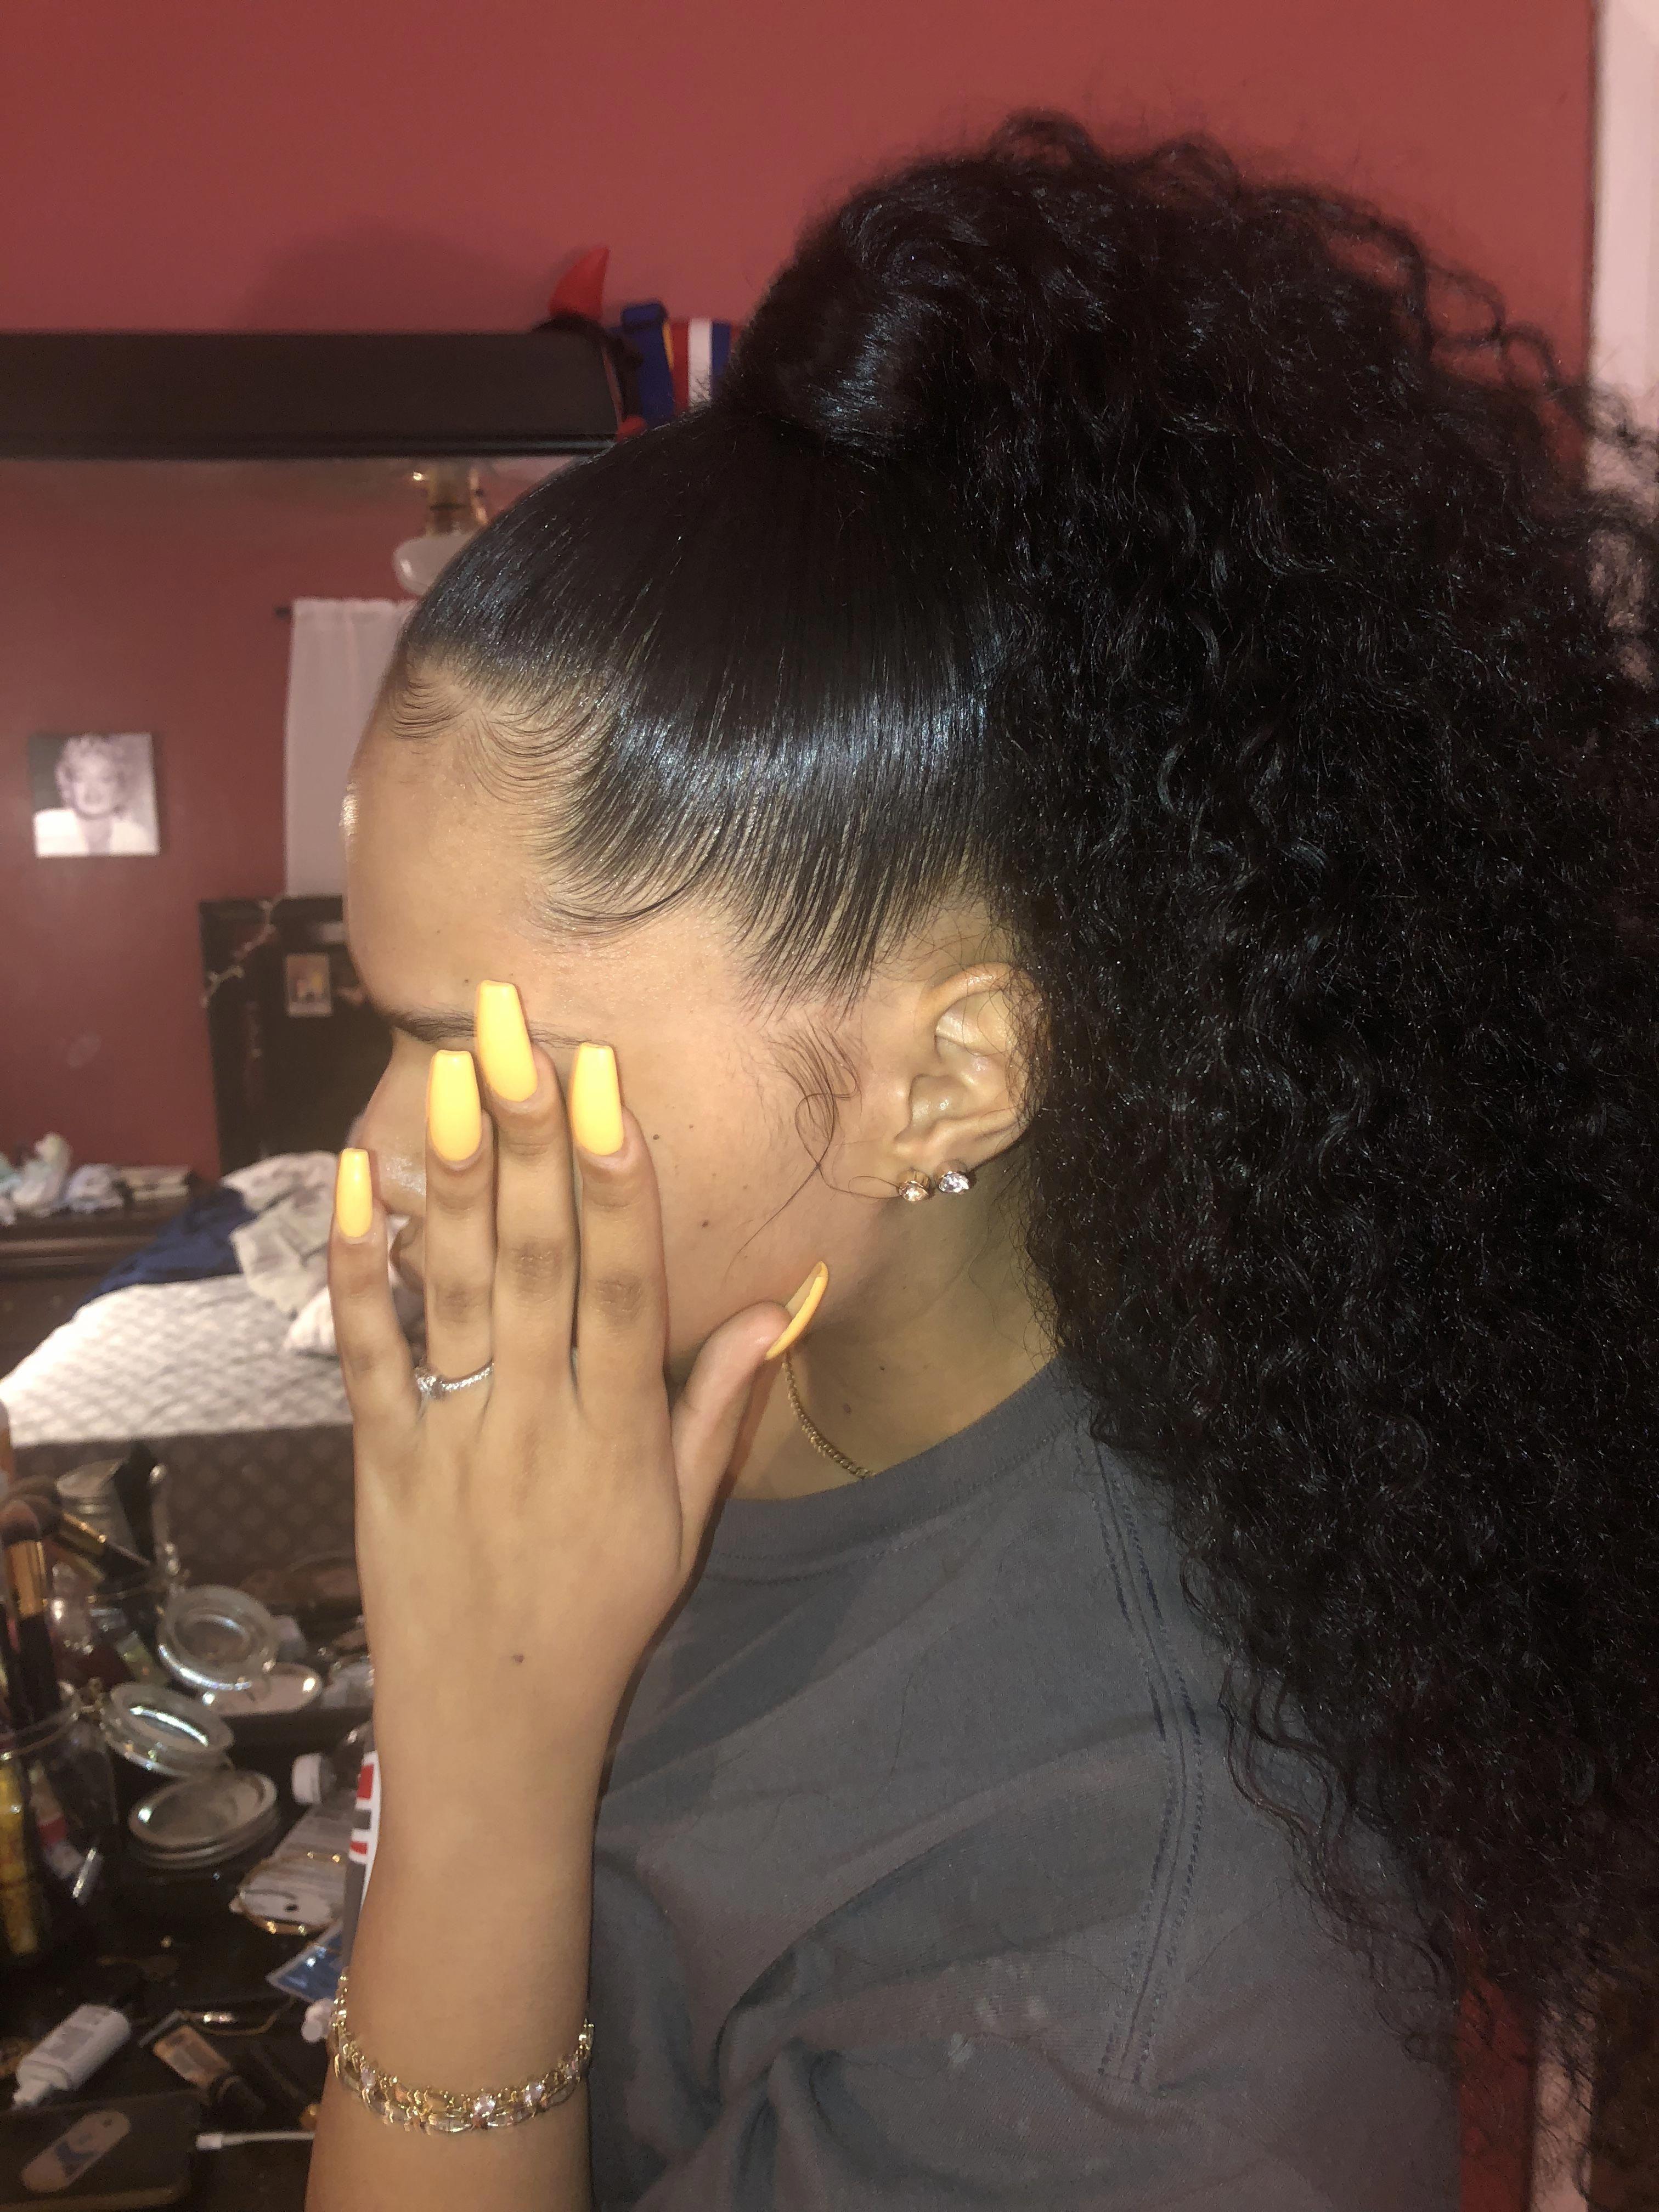 Easyhairstyles | Natural hair styles, Weave ponytail hairstyles, Hair